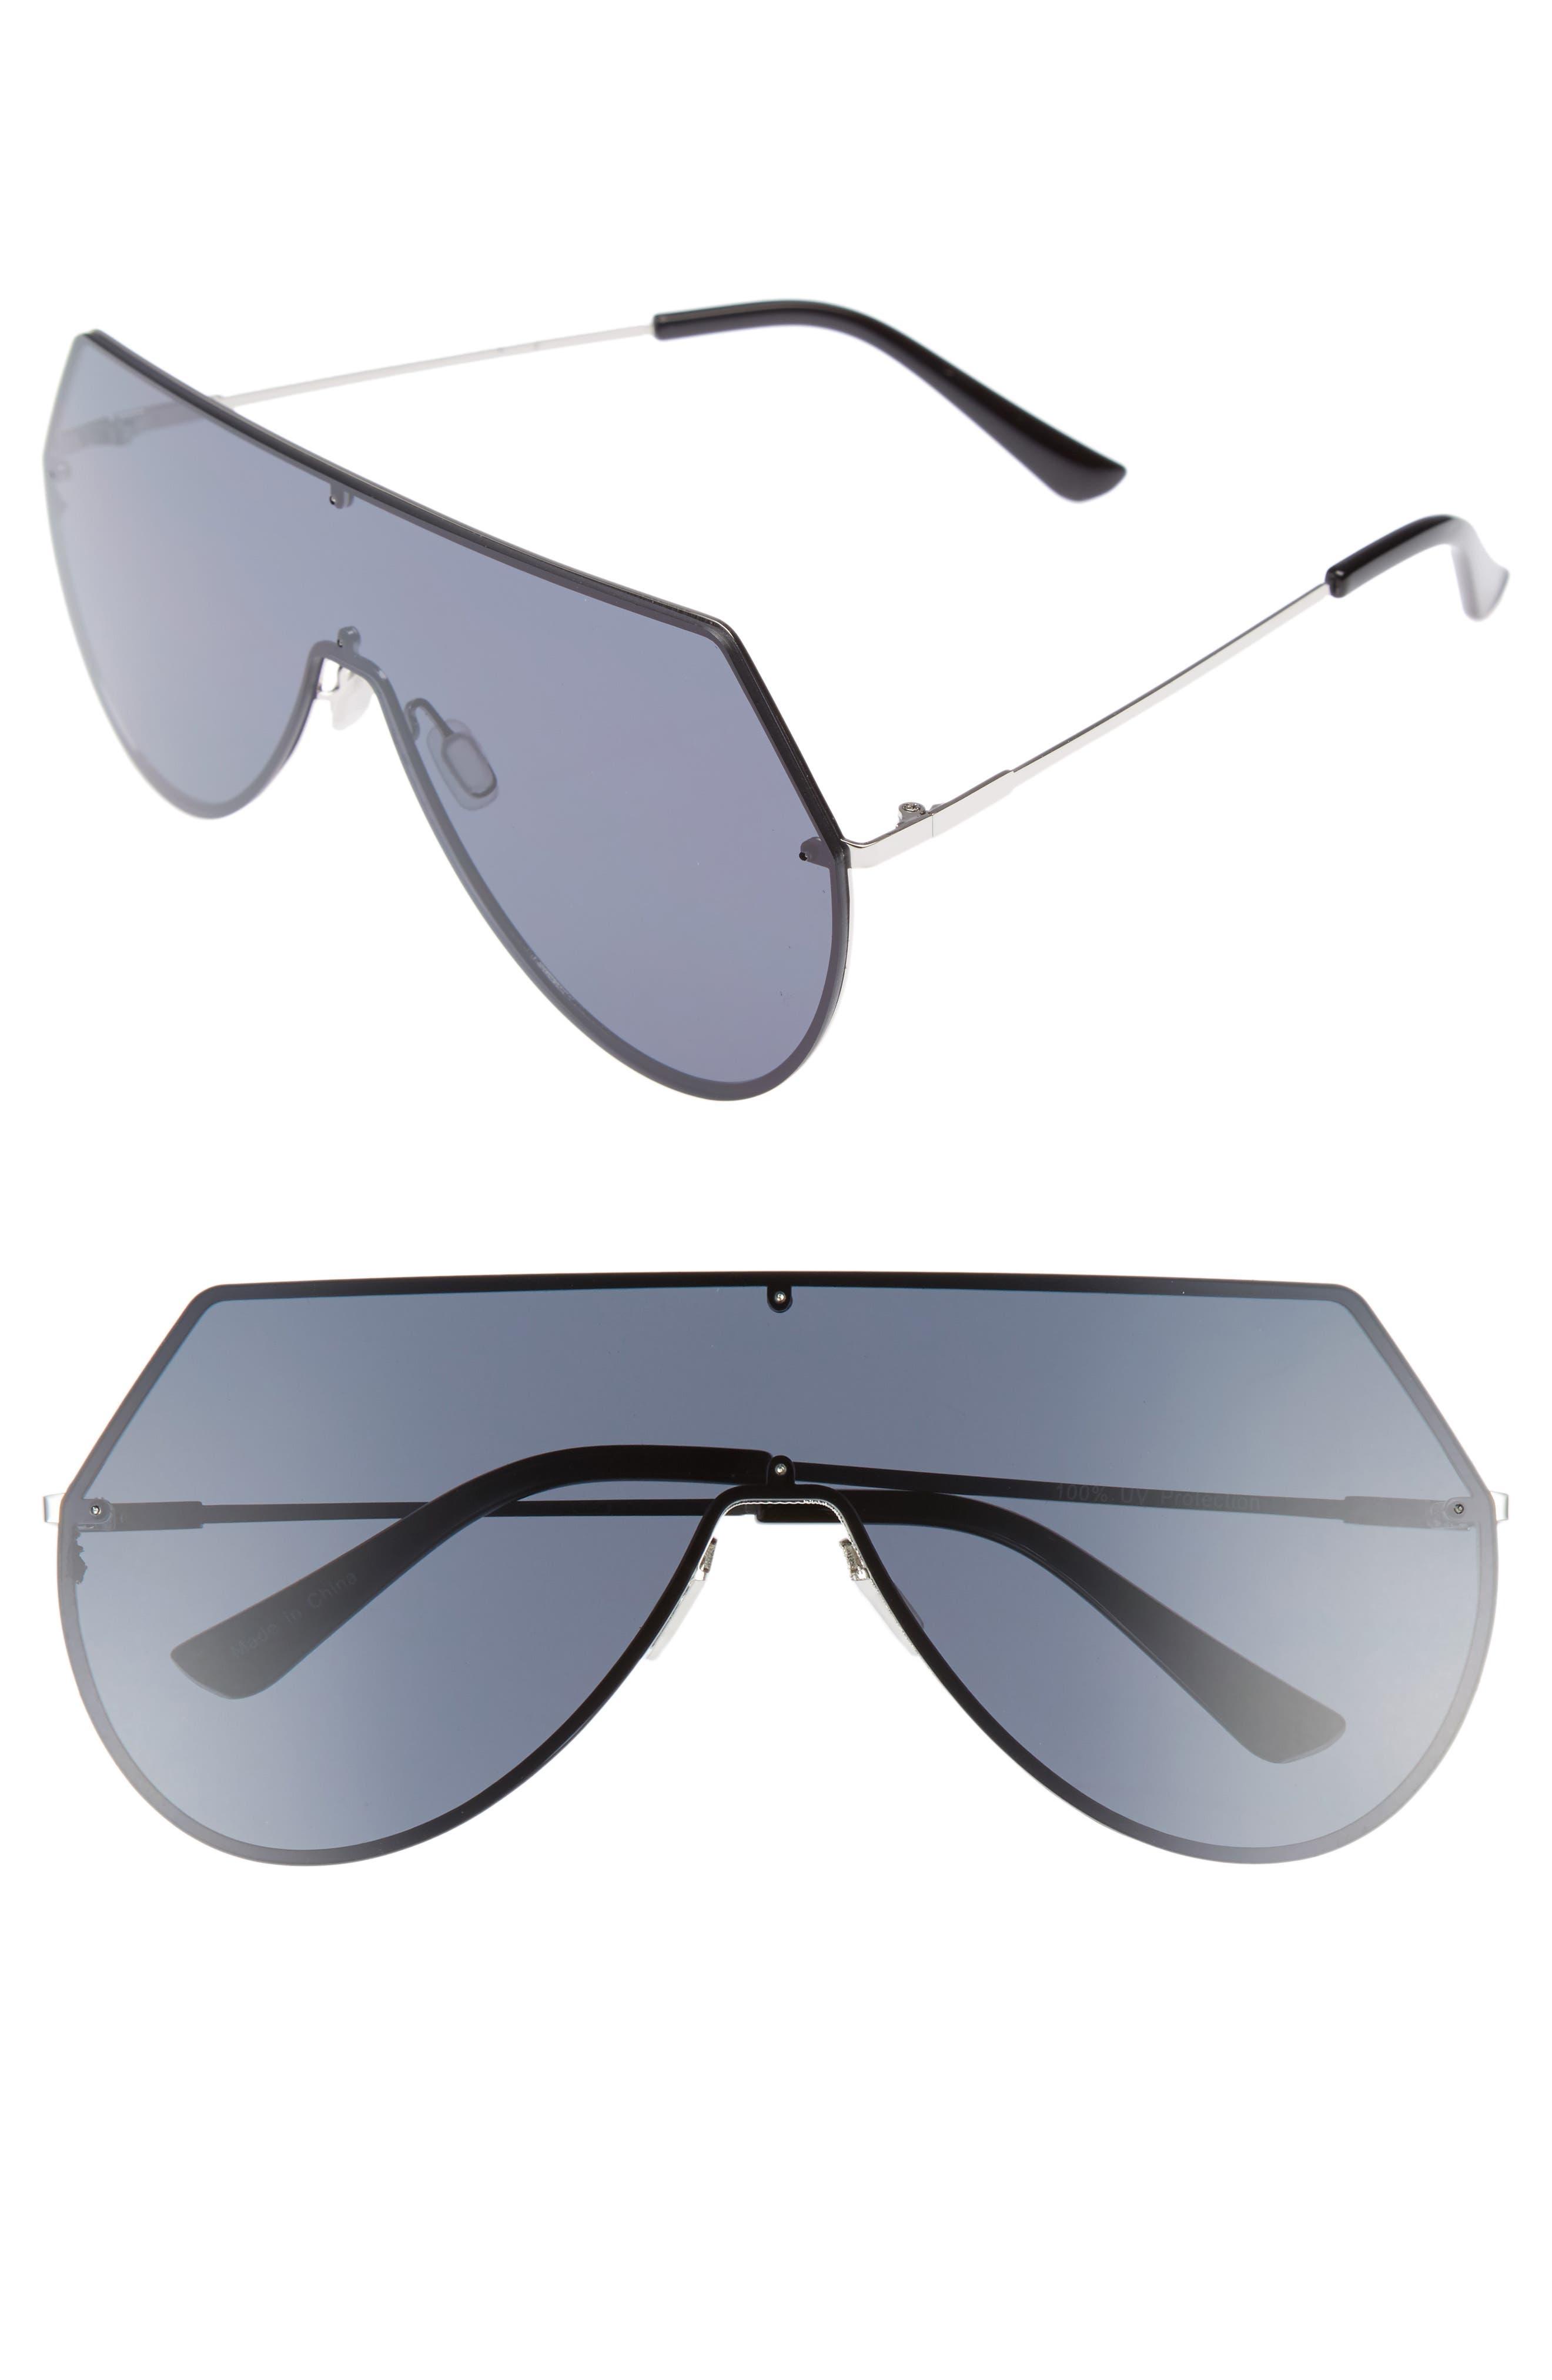 55mm Shield Sunglasses,                             Main thumbnail 1, color,                             001